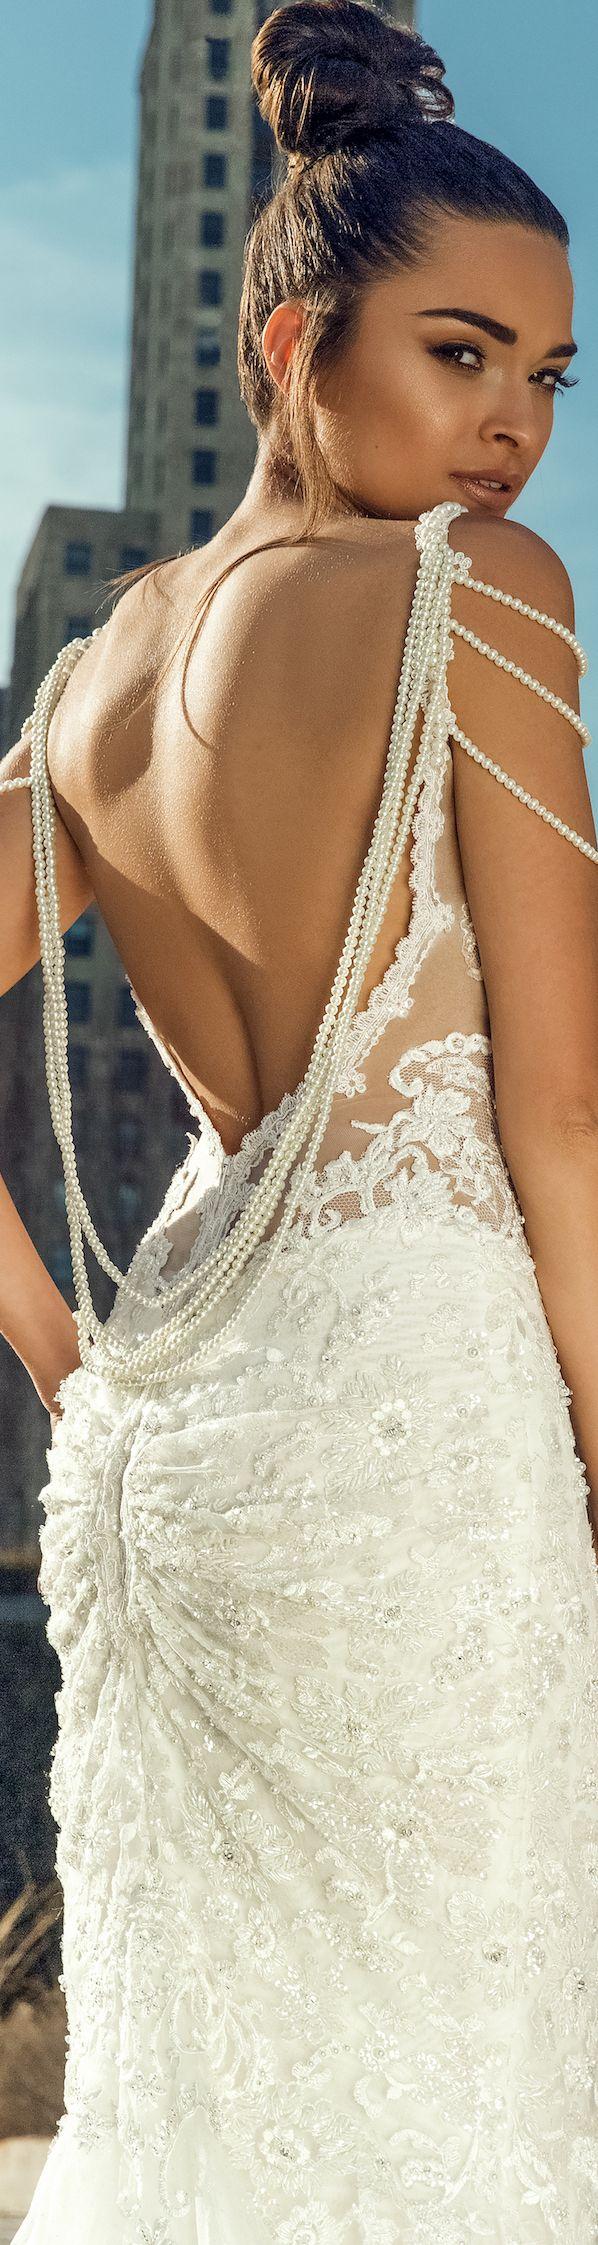 Haute Couture wedding dresses for romantic and modern brides and luxury fashion gown for evening parties- GaliaLahav   Photographer/Director - Clif Ellis (@clifellis)  HMUA - Paula Silva (@paula.silva.artistry)  Blonde Model - Meredith Malin (@meredithmalin)  Brunette Model - Jennifer Rey (@jennifersai)